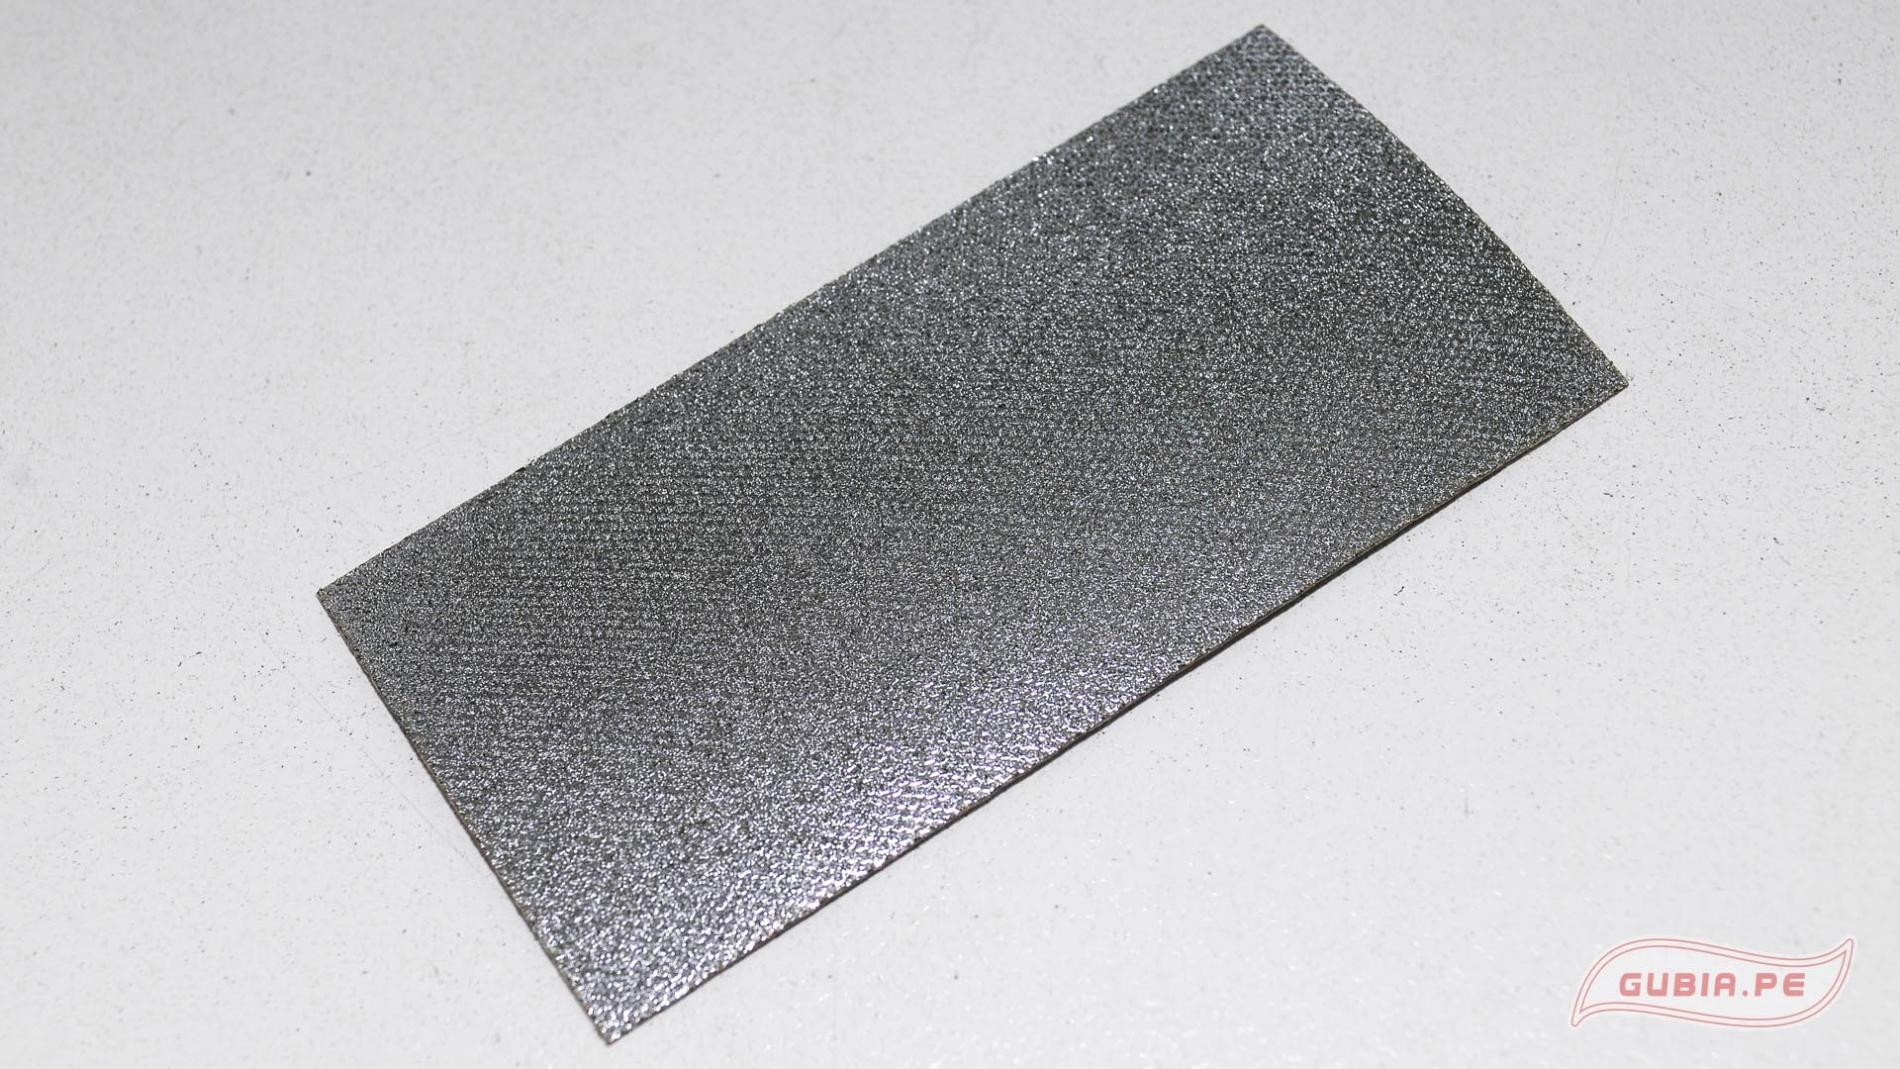 ATS5x10#14-Lamina diamantada cobre 100x50x0.5mm grano 140 Atoma ATS5x10#14-max-4.